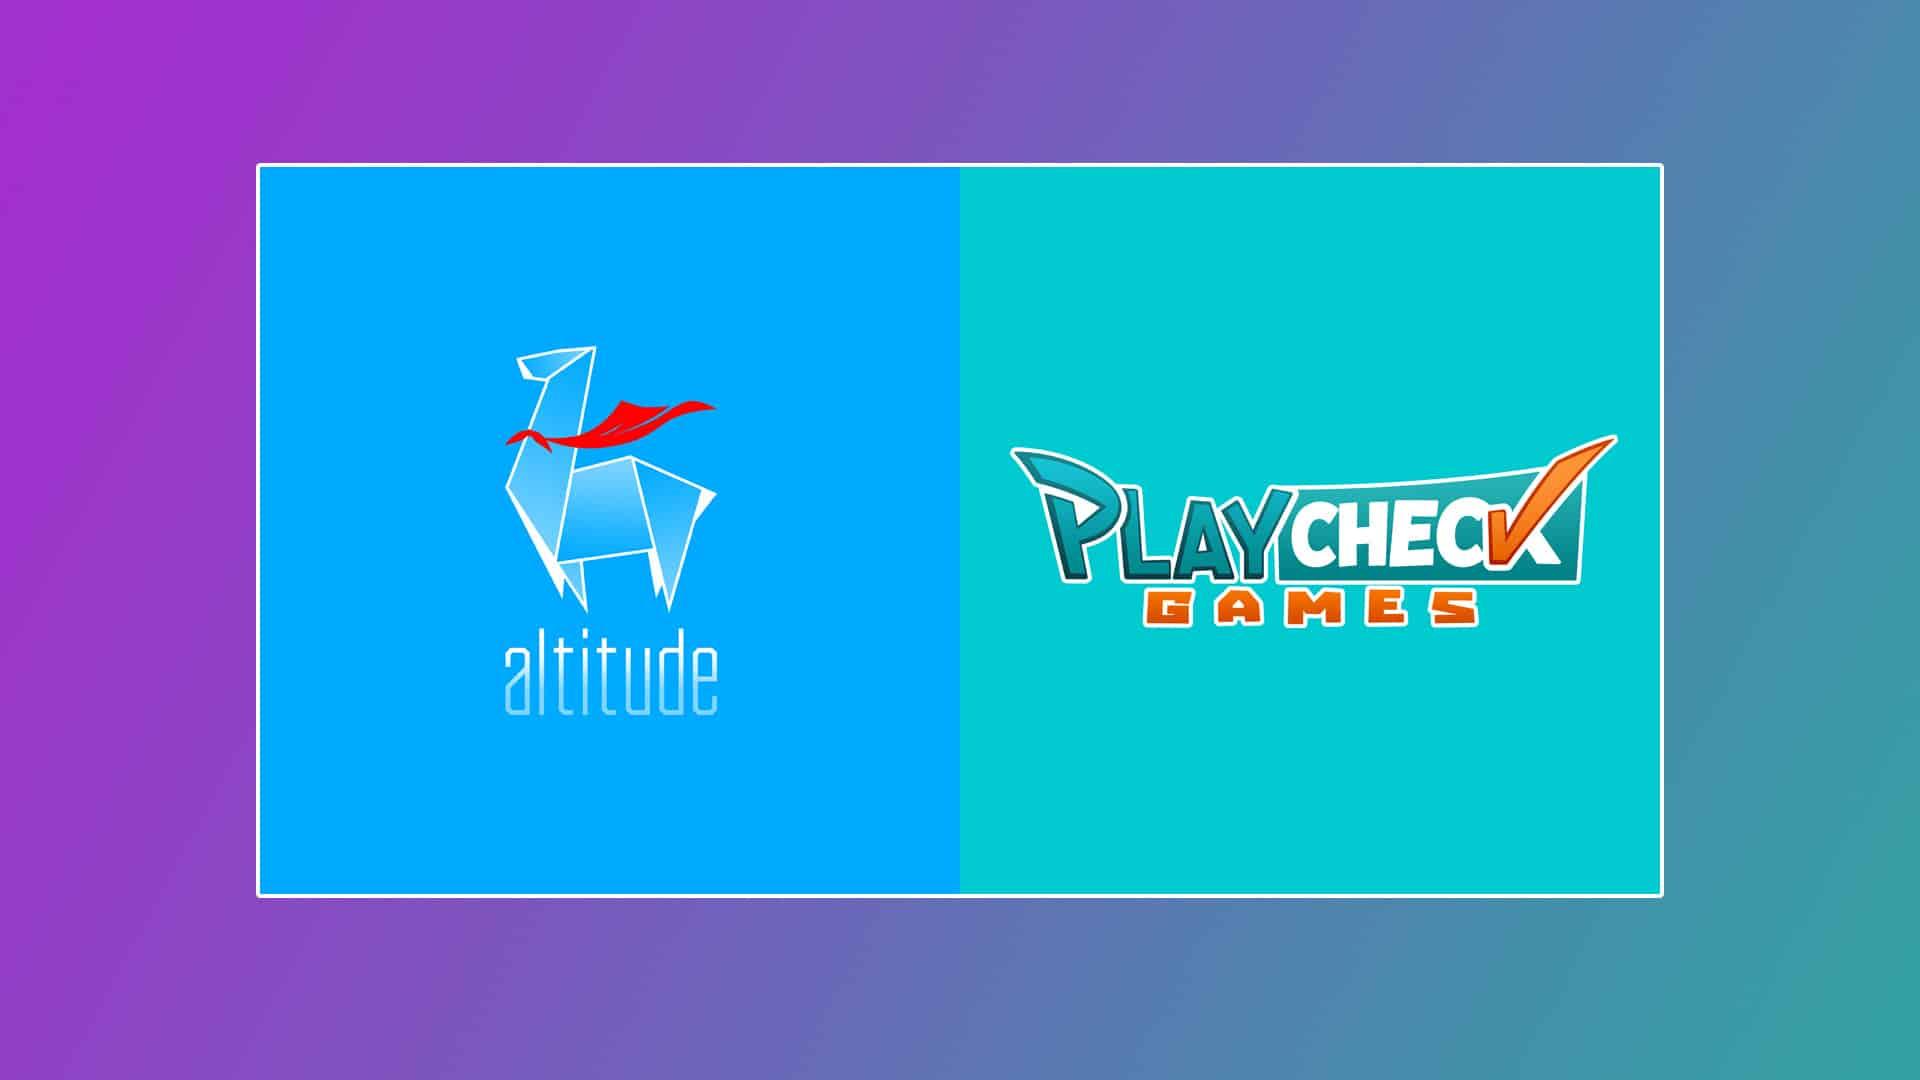 Playcheck Games